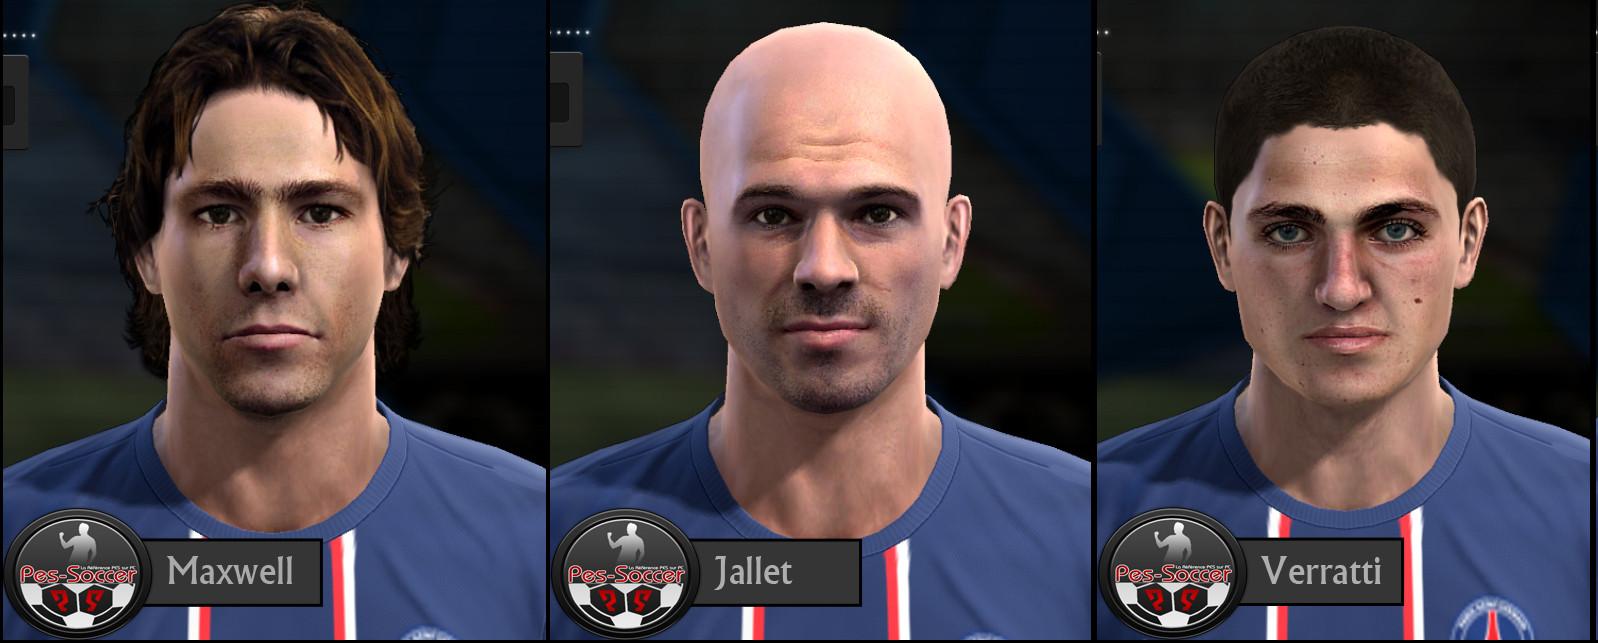 Maxwell, Christophe Jallet e Marco Verratti Faces - PES 2013